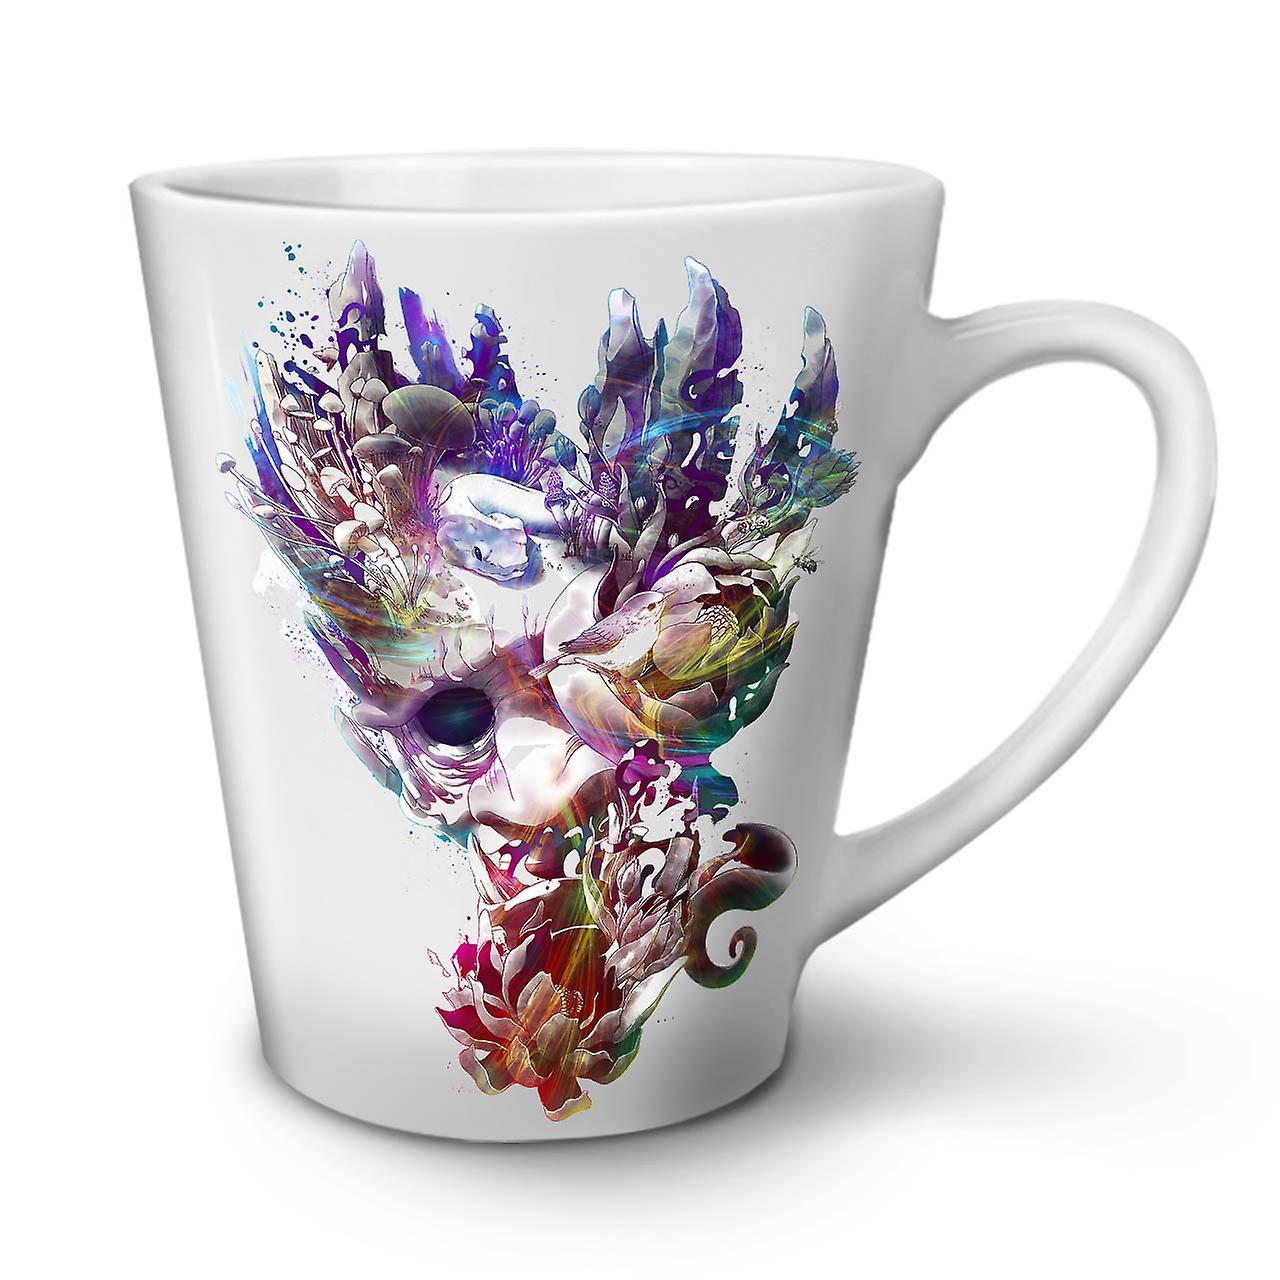 Art Face Mystic Fashion NEW White Tea Coffee Ceramic Latte Mug 12 oz | Wellcoda